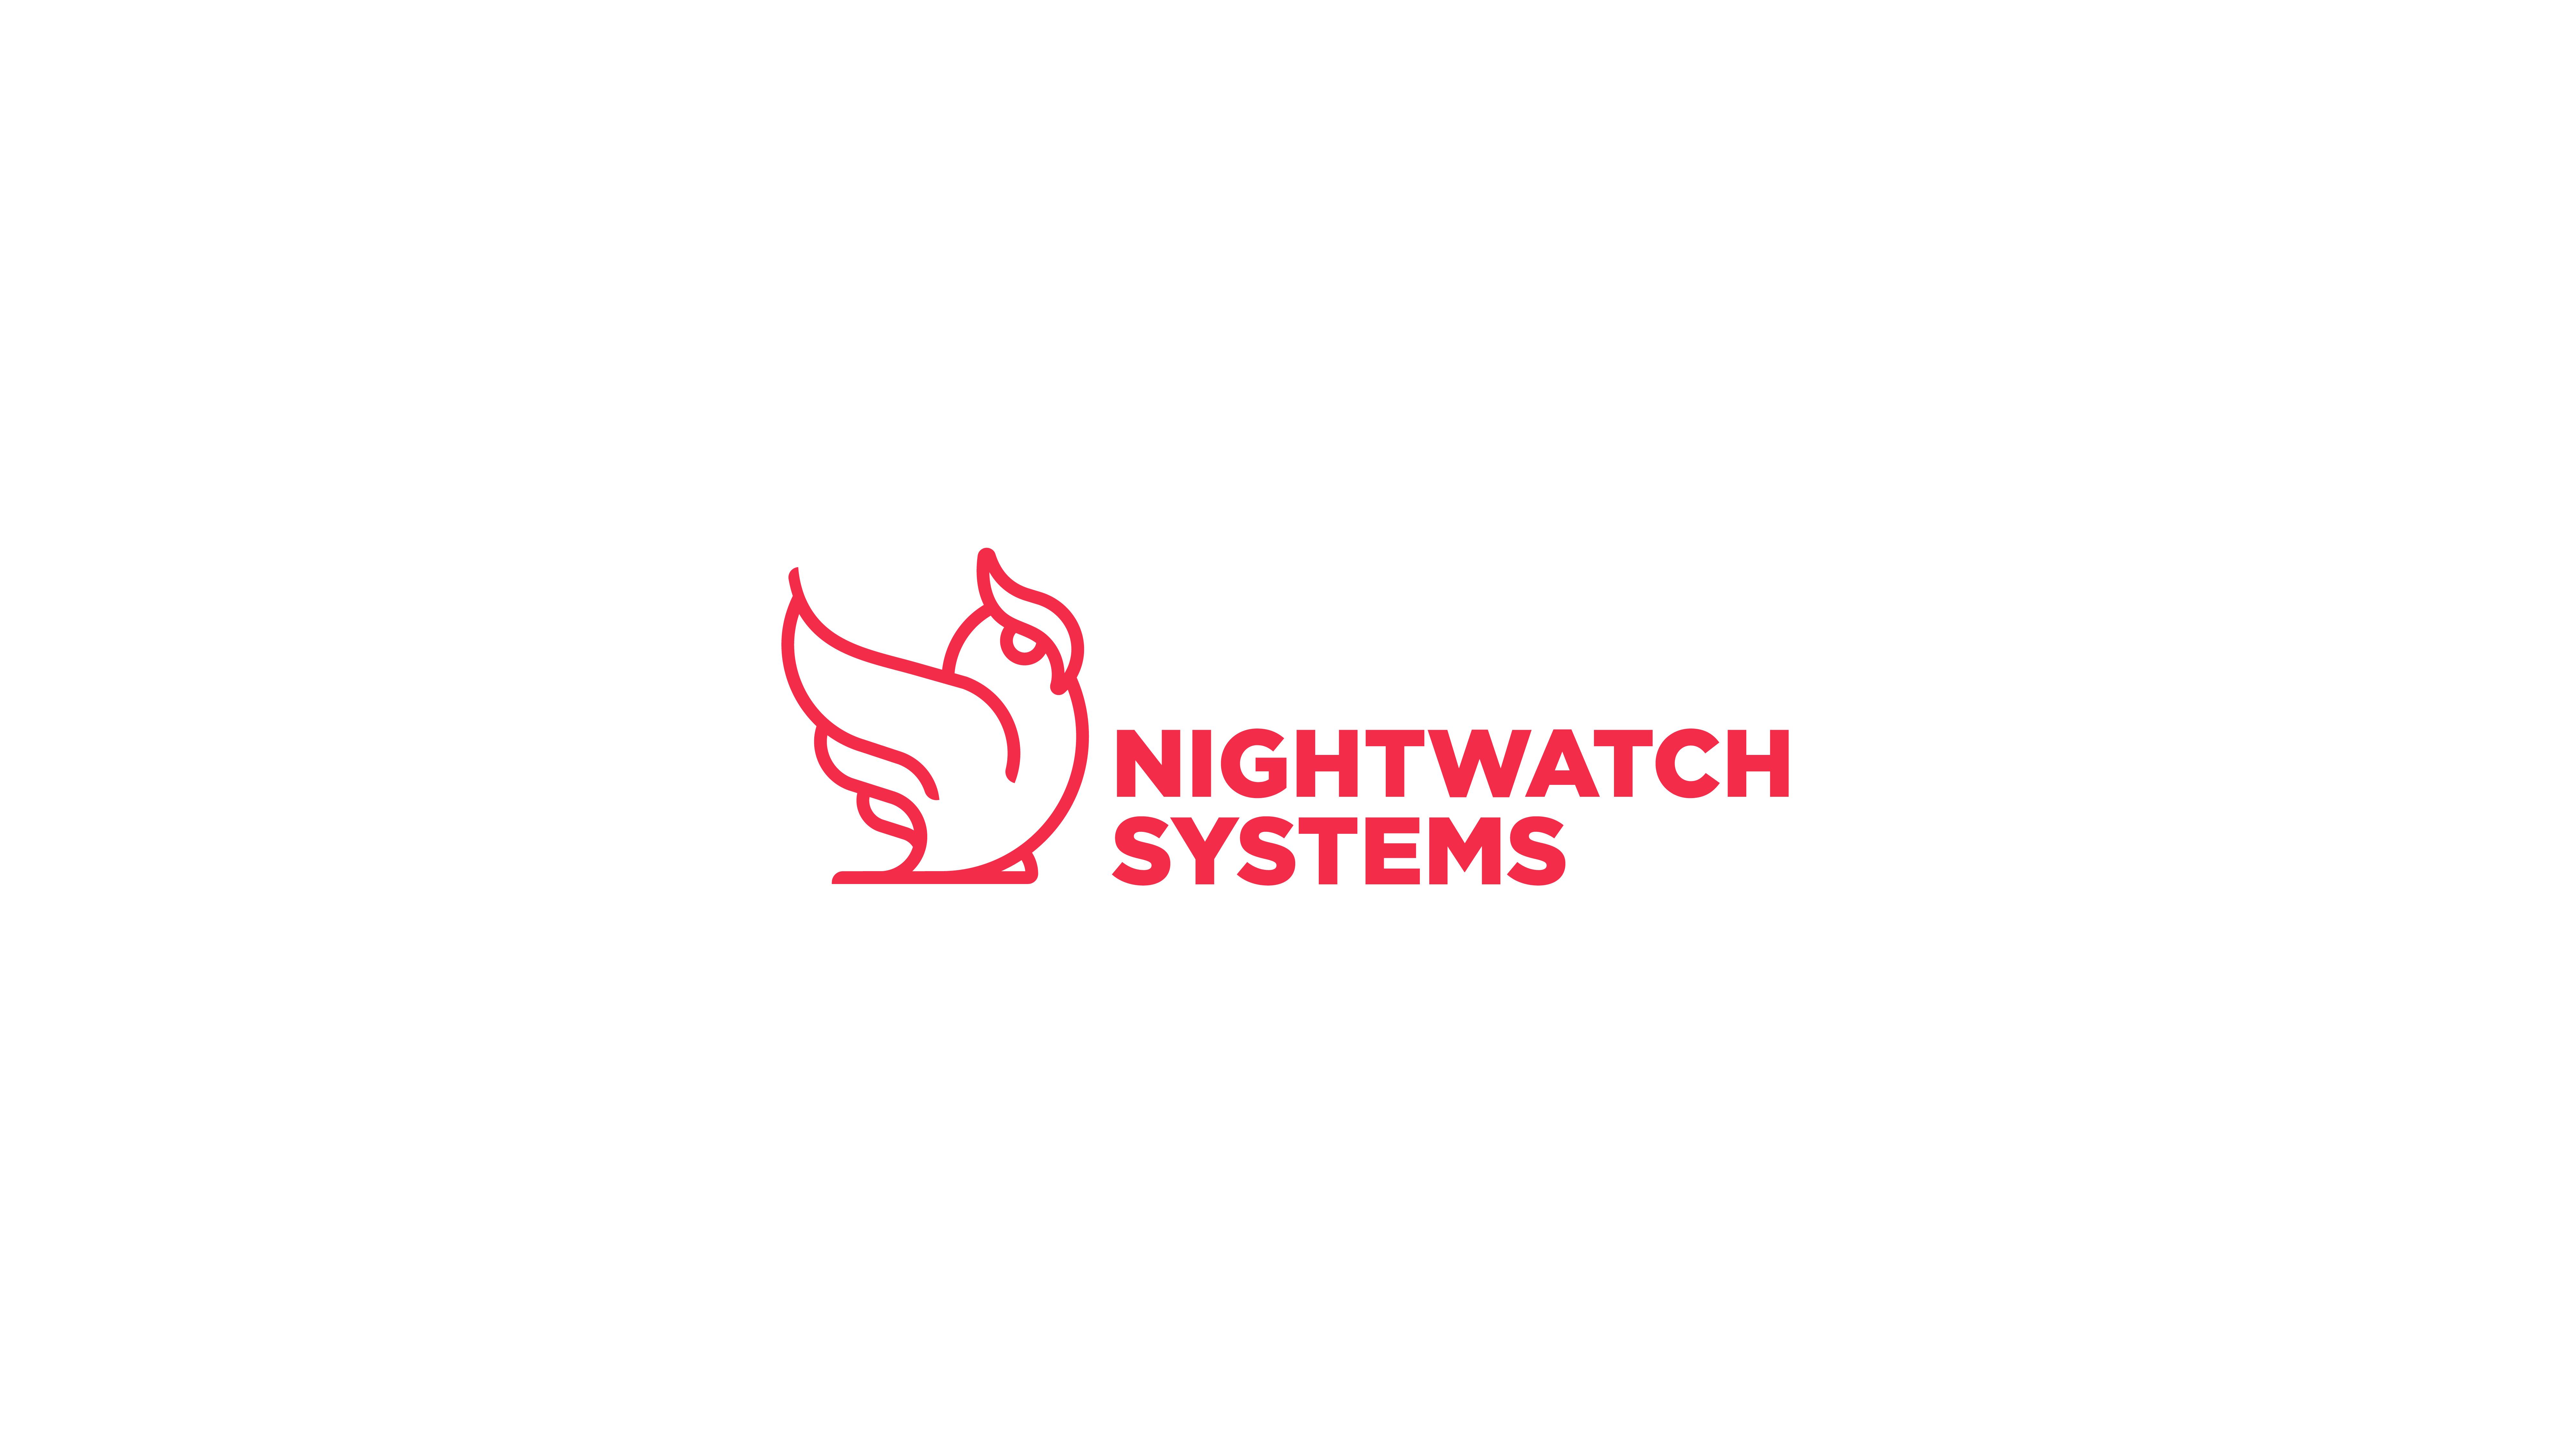 New_Web_Logos_2018-08